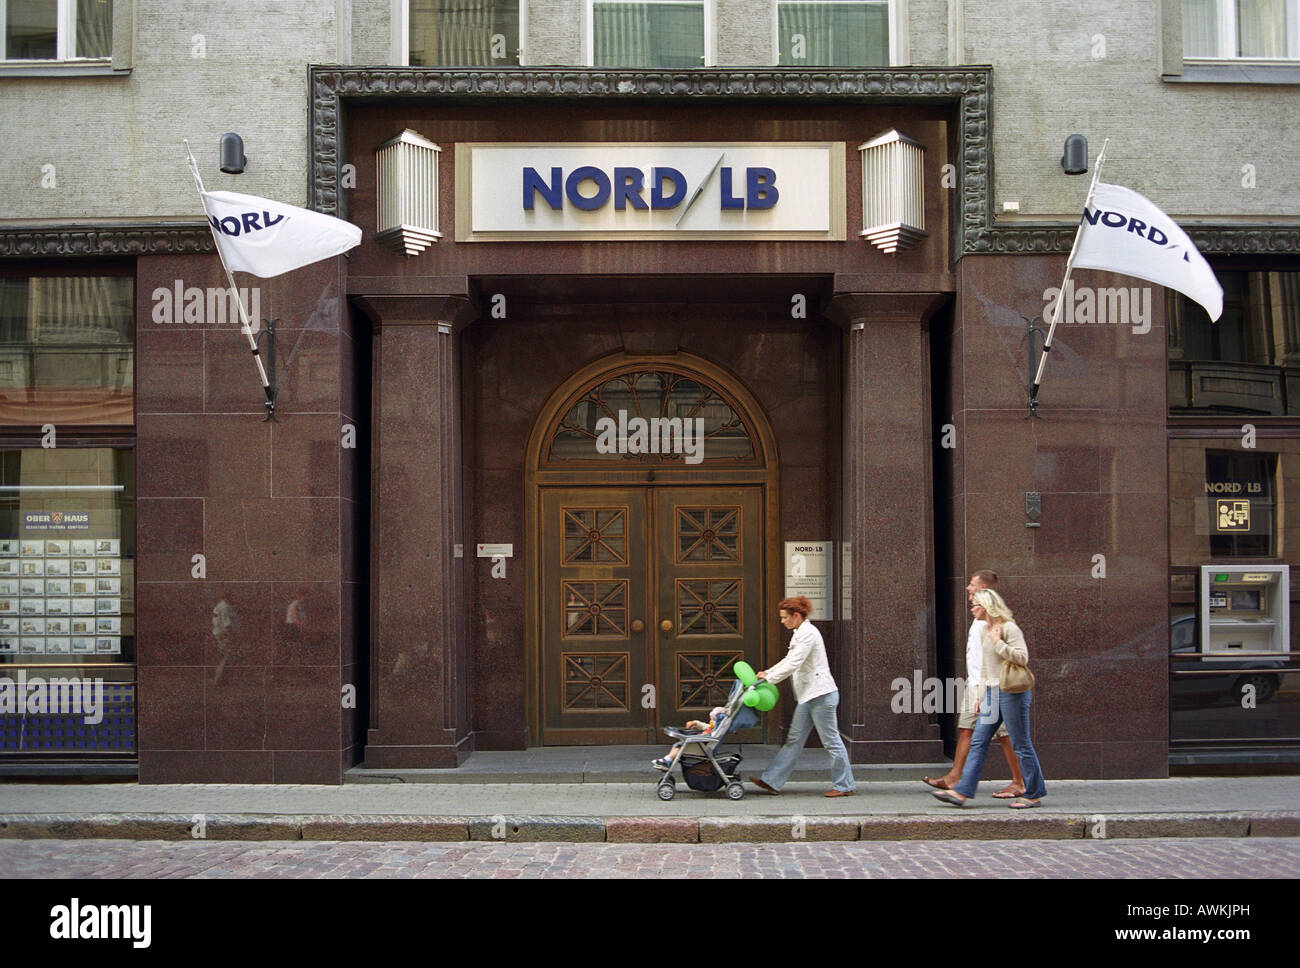 Branch of the NORD/LB in Riga, Latvia Stock Photo